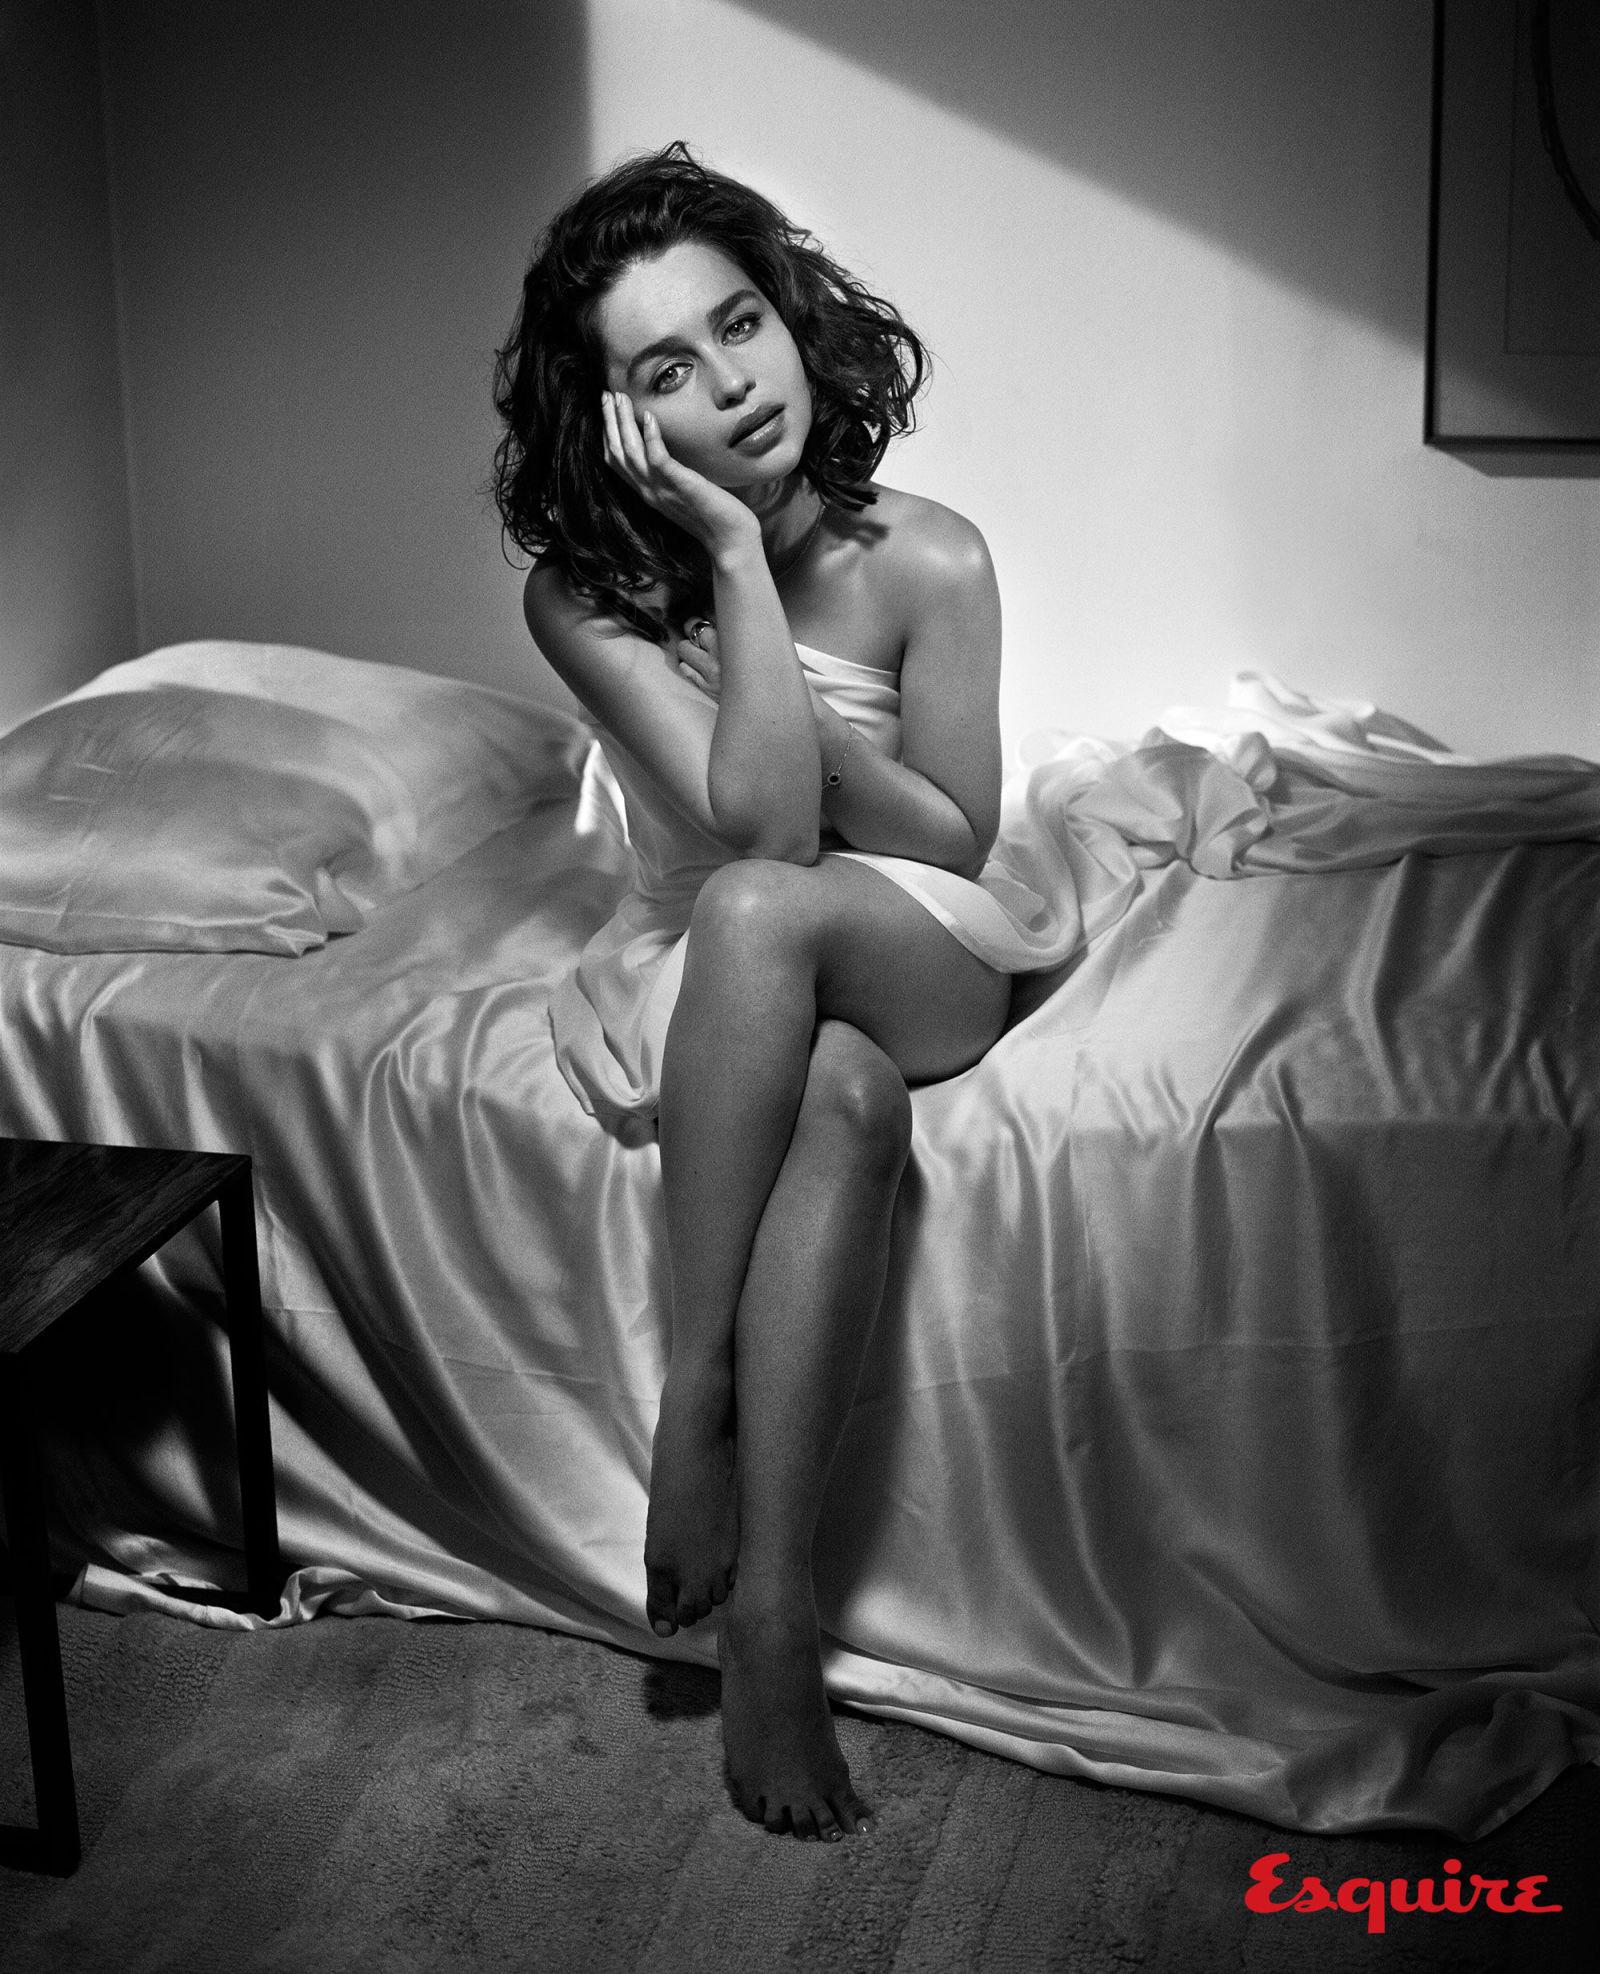 news october emilia clarke esquires sexiest woman alive